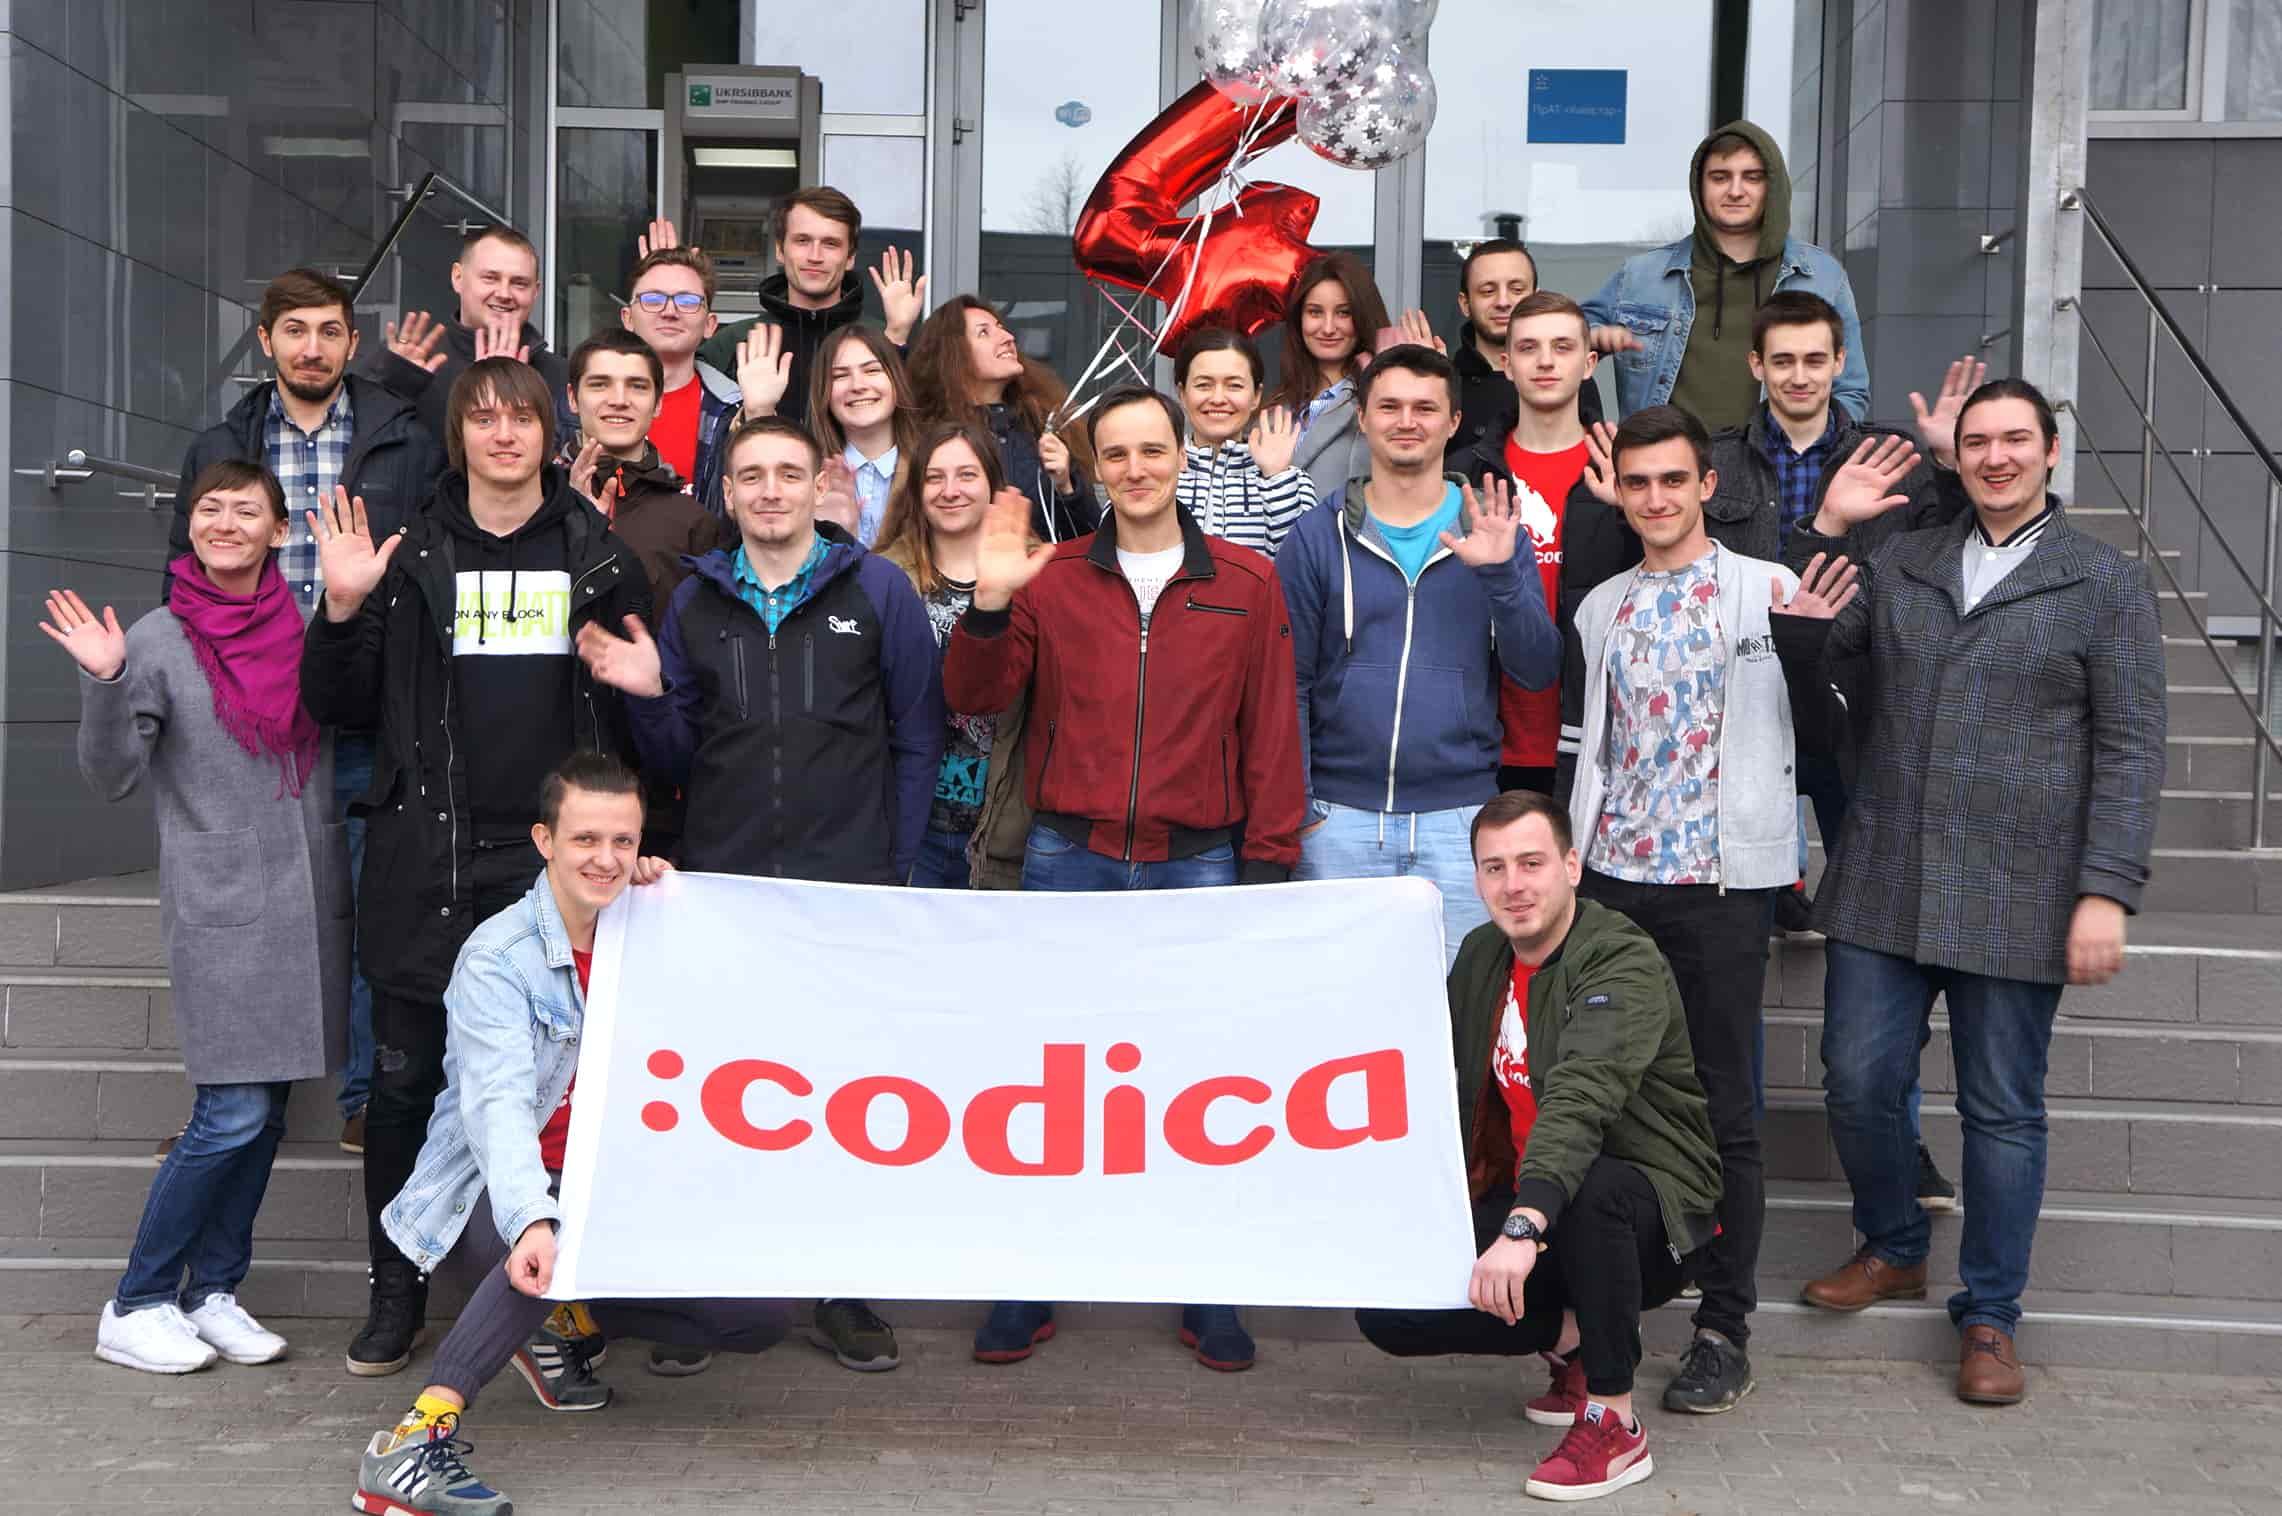 The celebration of Codica's birthday | Codica